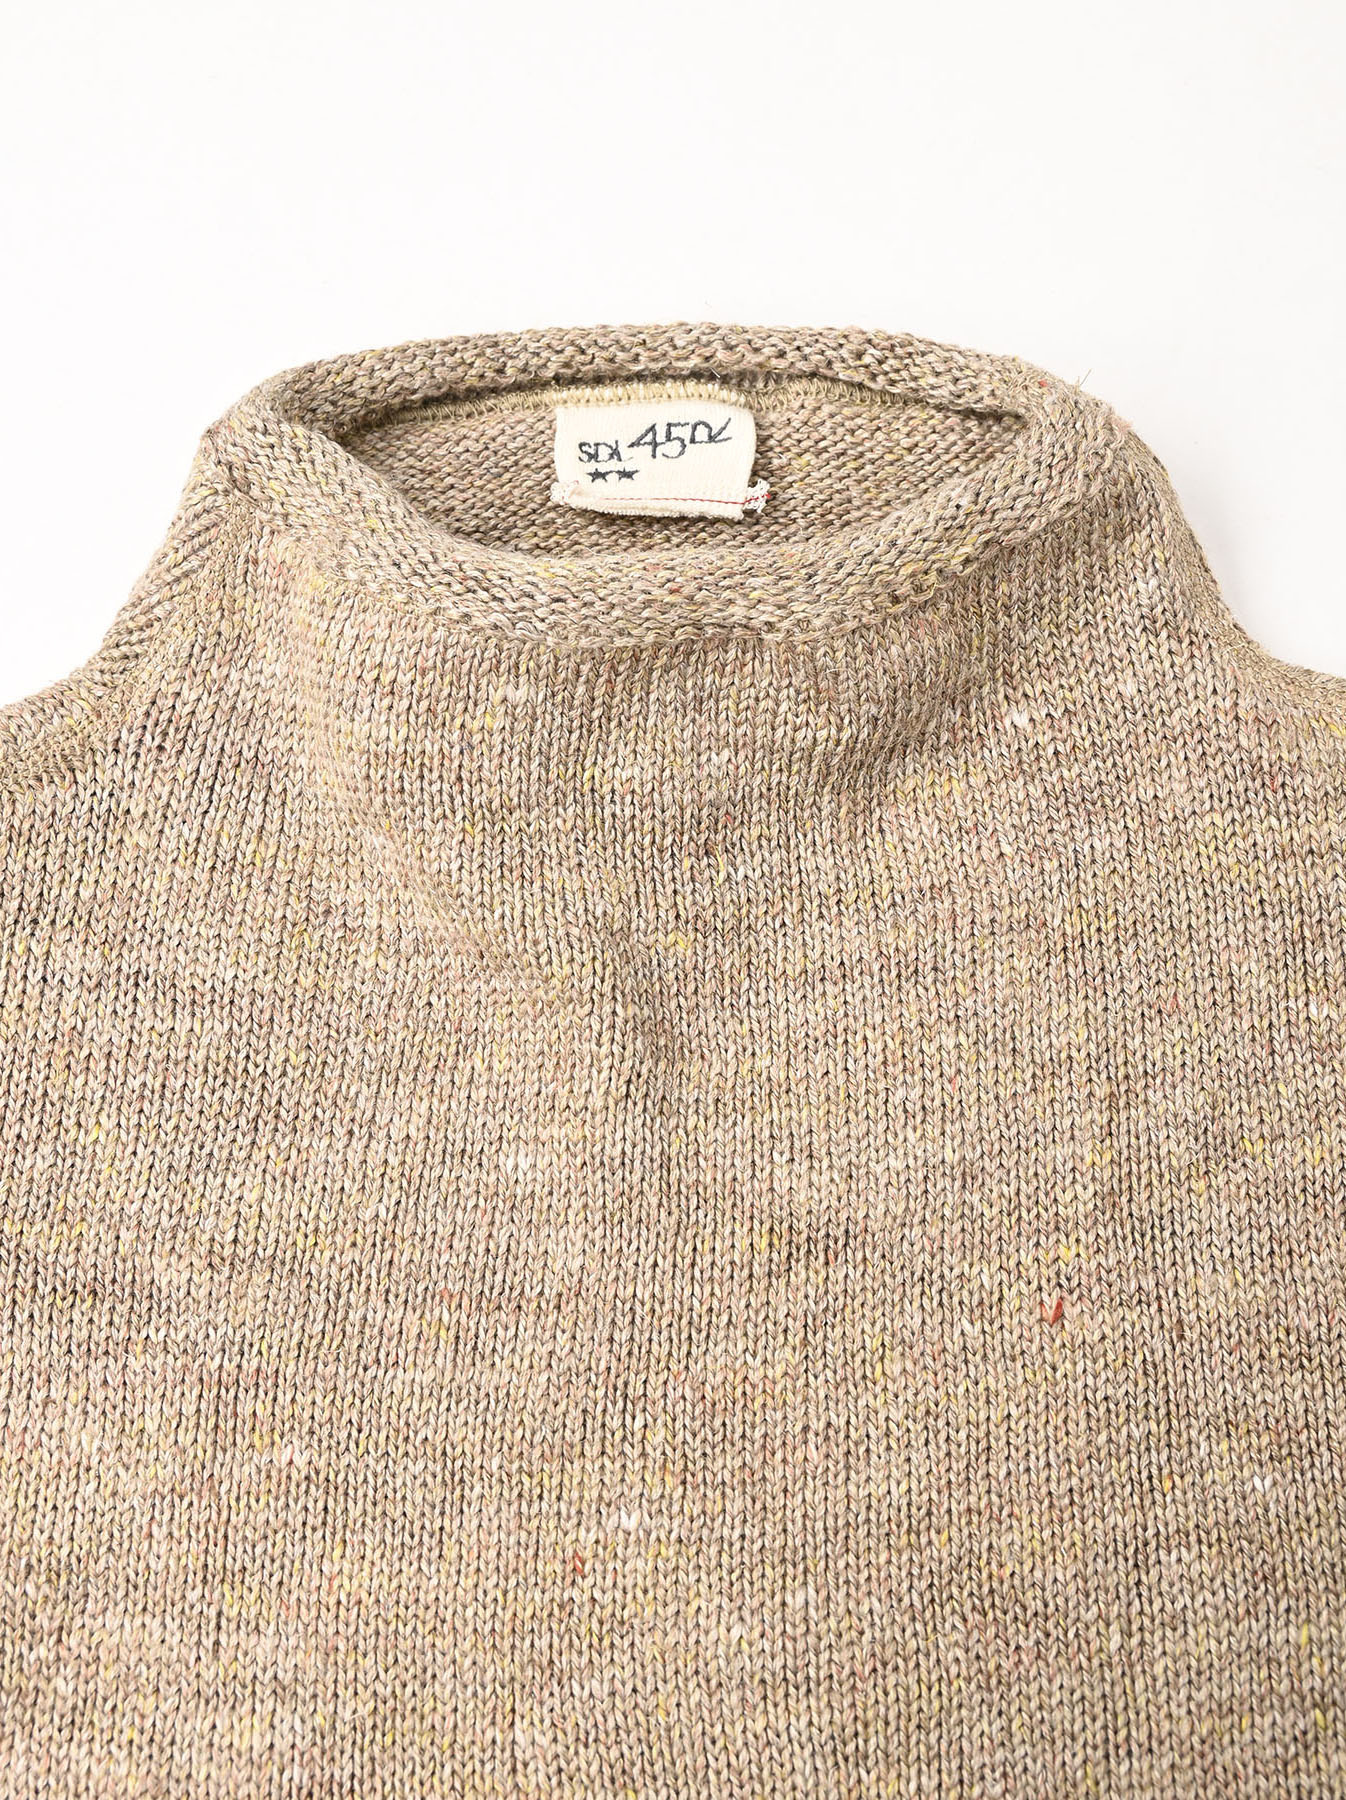 WH Linen Tweed Knit-sew 908 Umahiko Sweater (0321)-11